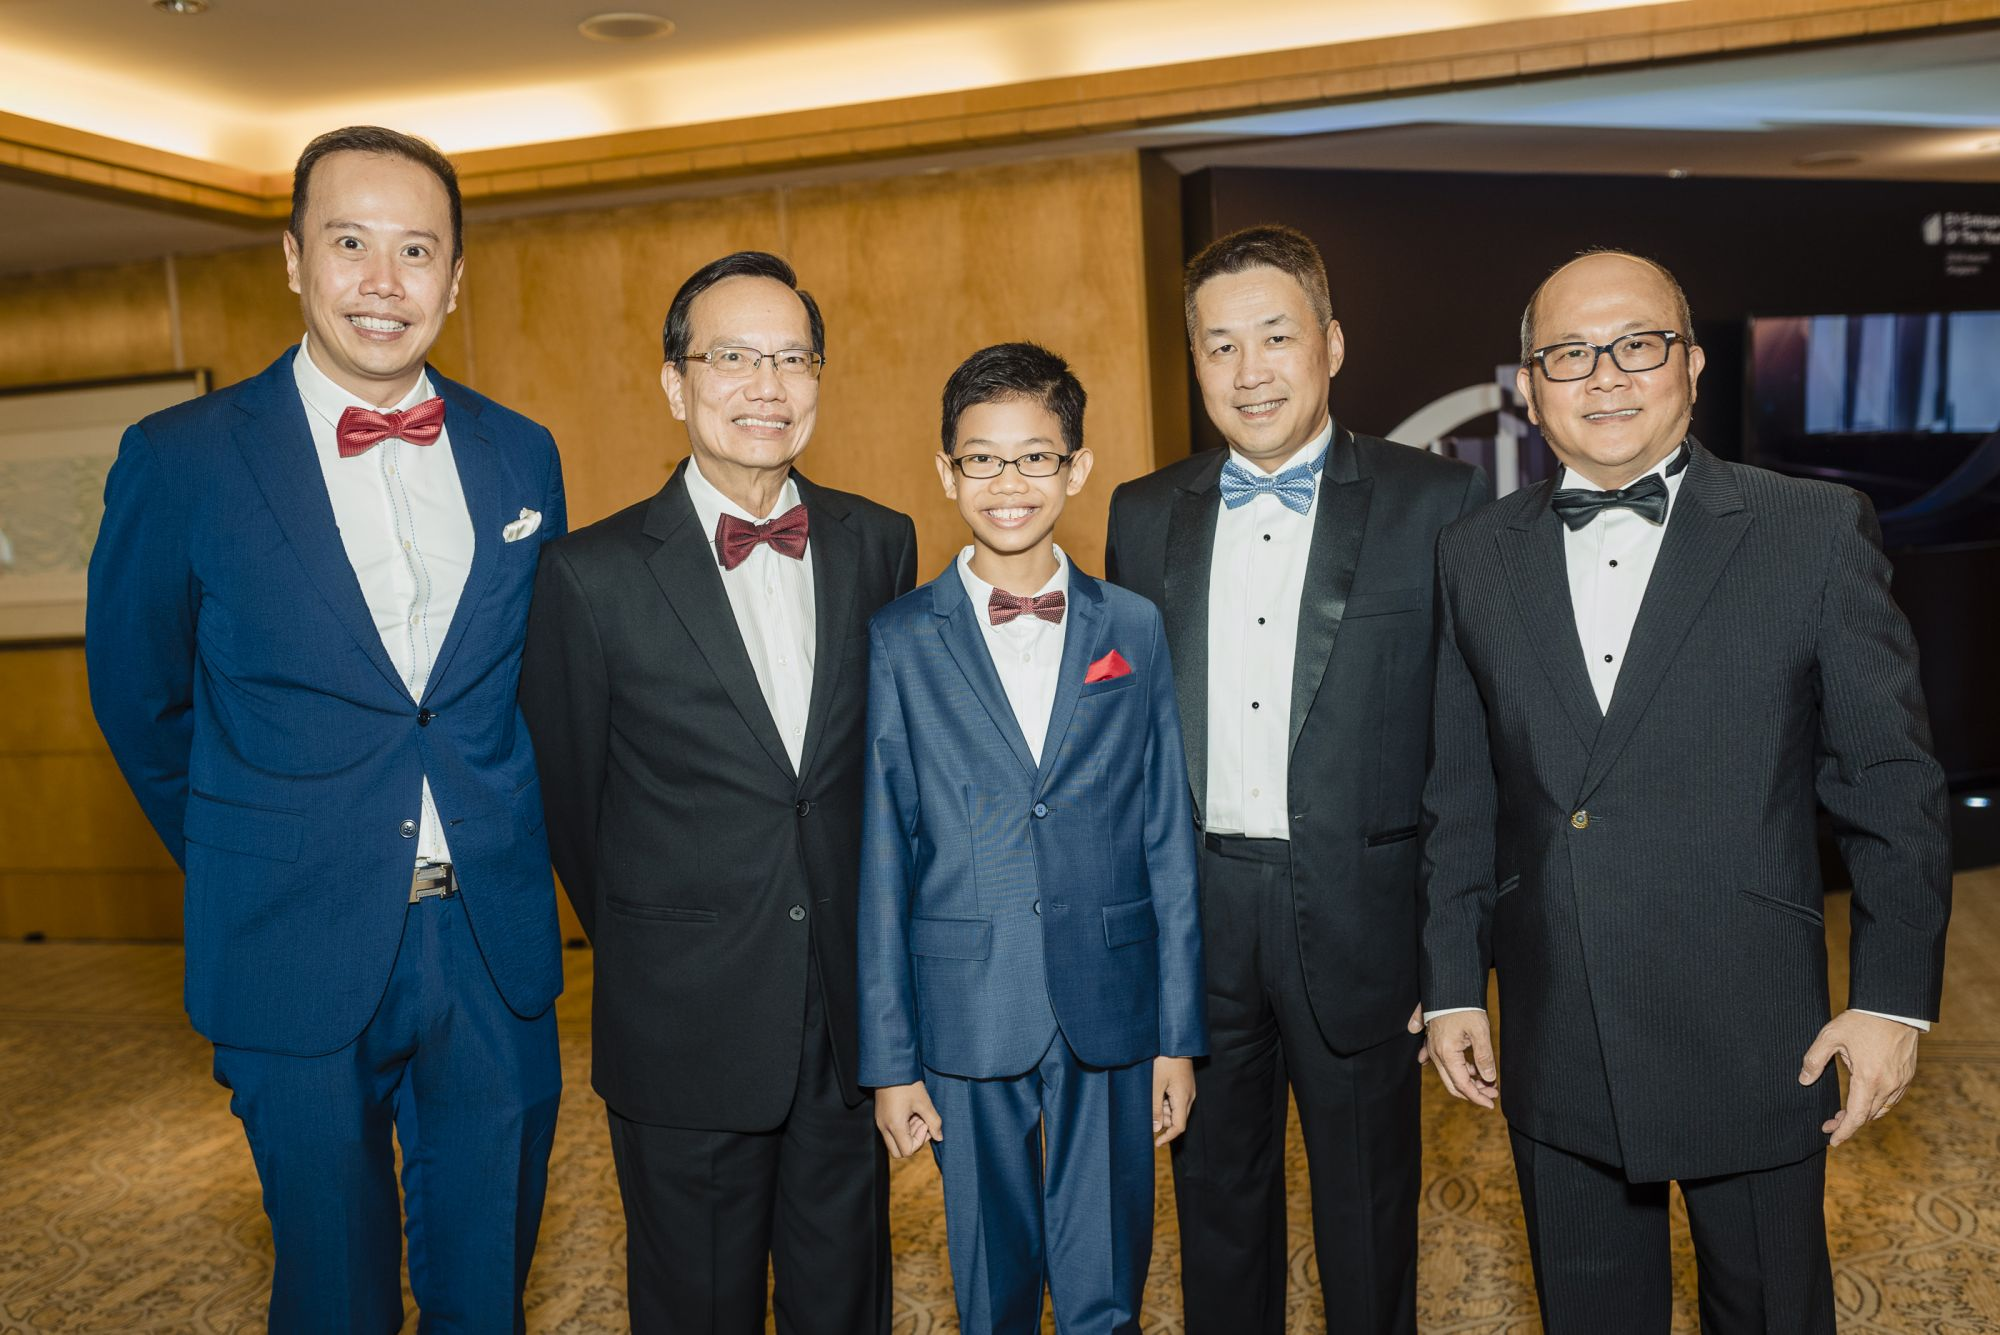 Mark Lee, Patrick Lee, Ethan Lee, Max Loh, Ron Sim